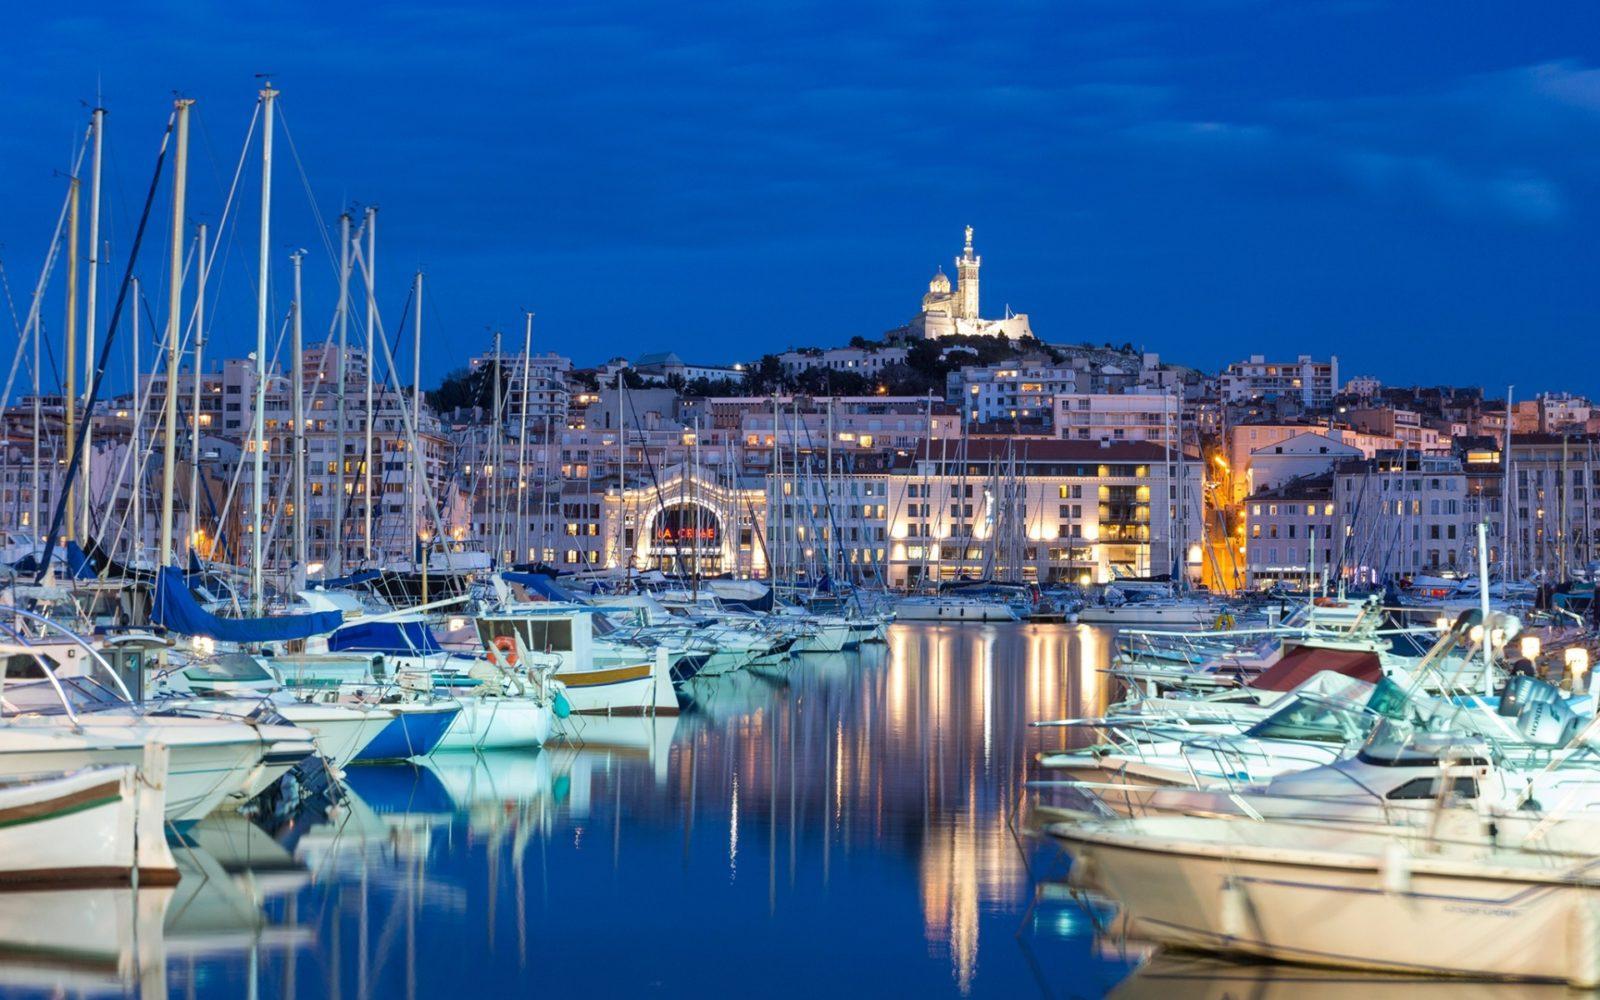 marseille bay evening yacht parking white yachts - იაფი ავიაბილეთები მარსელის მიმართულებით